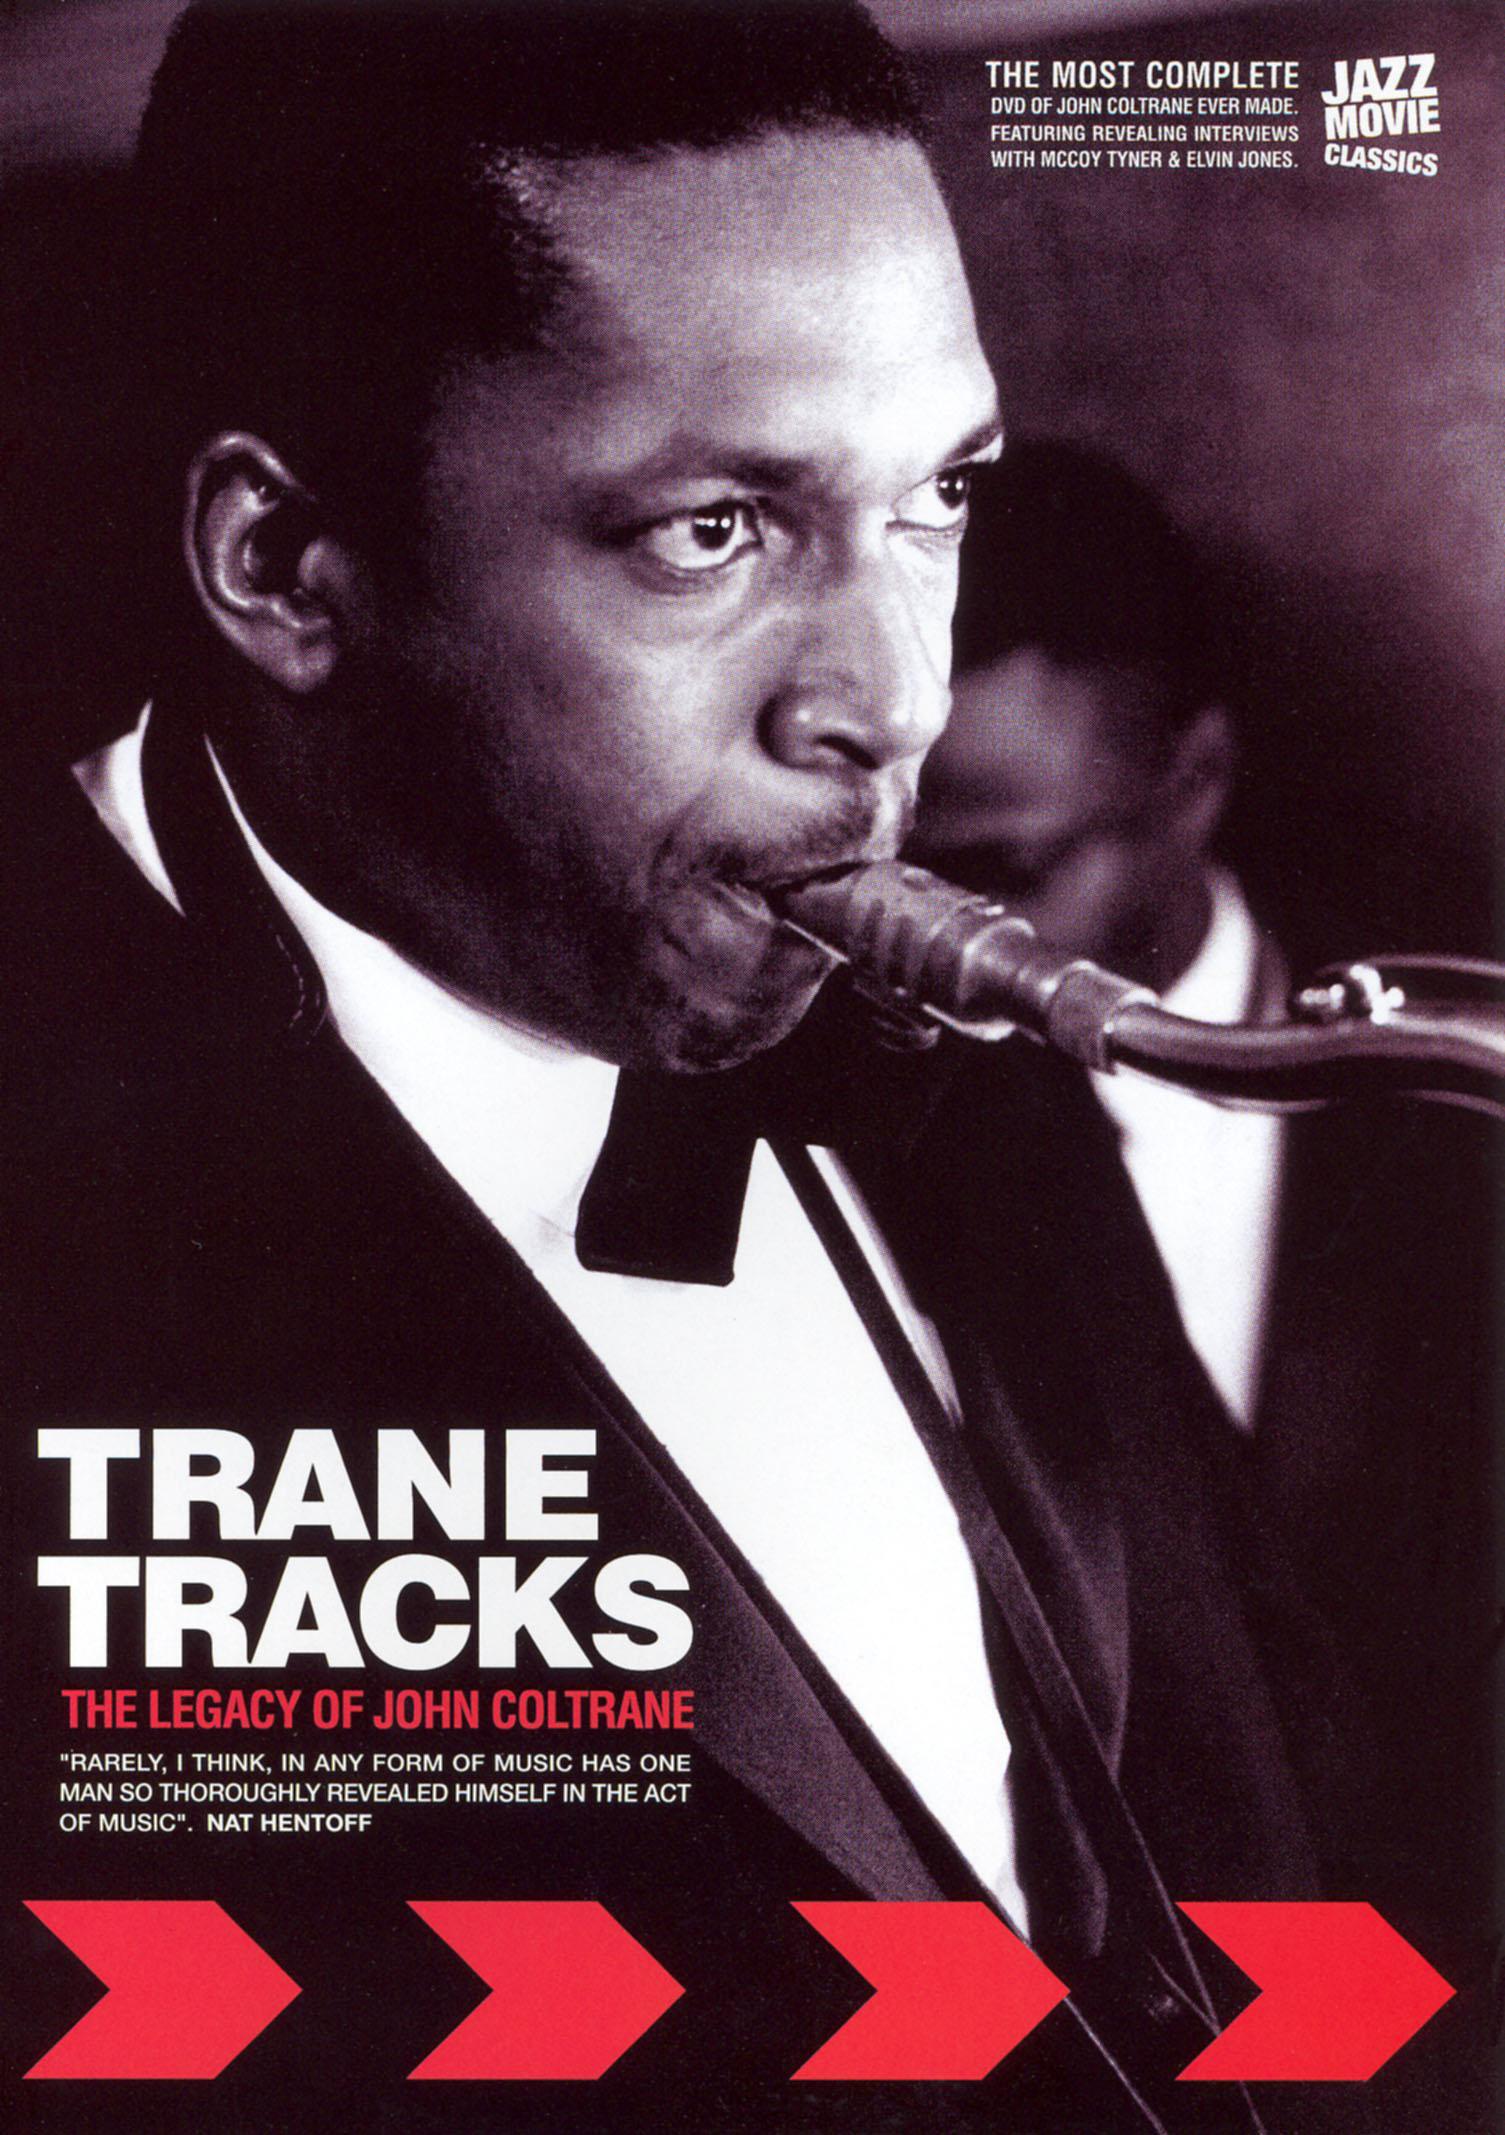 John Coltrane: Trane Tracks